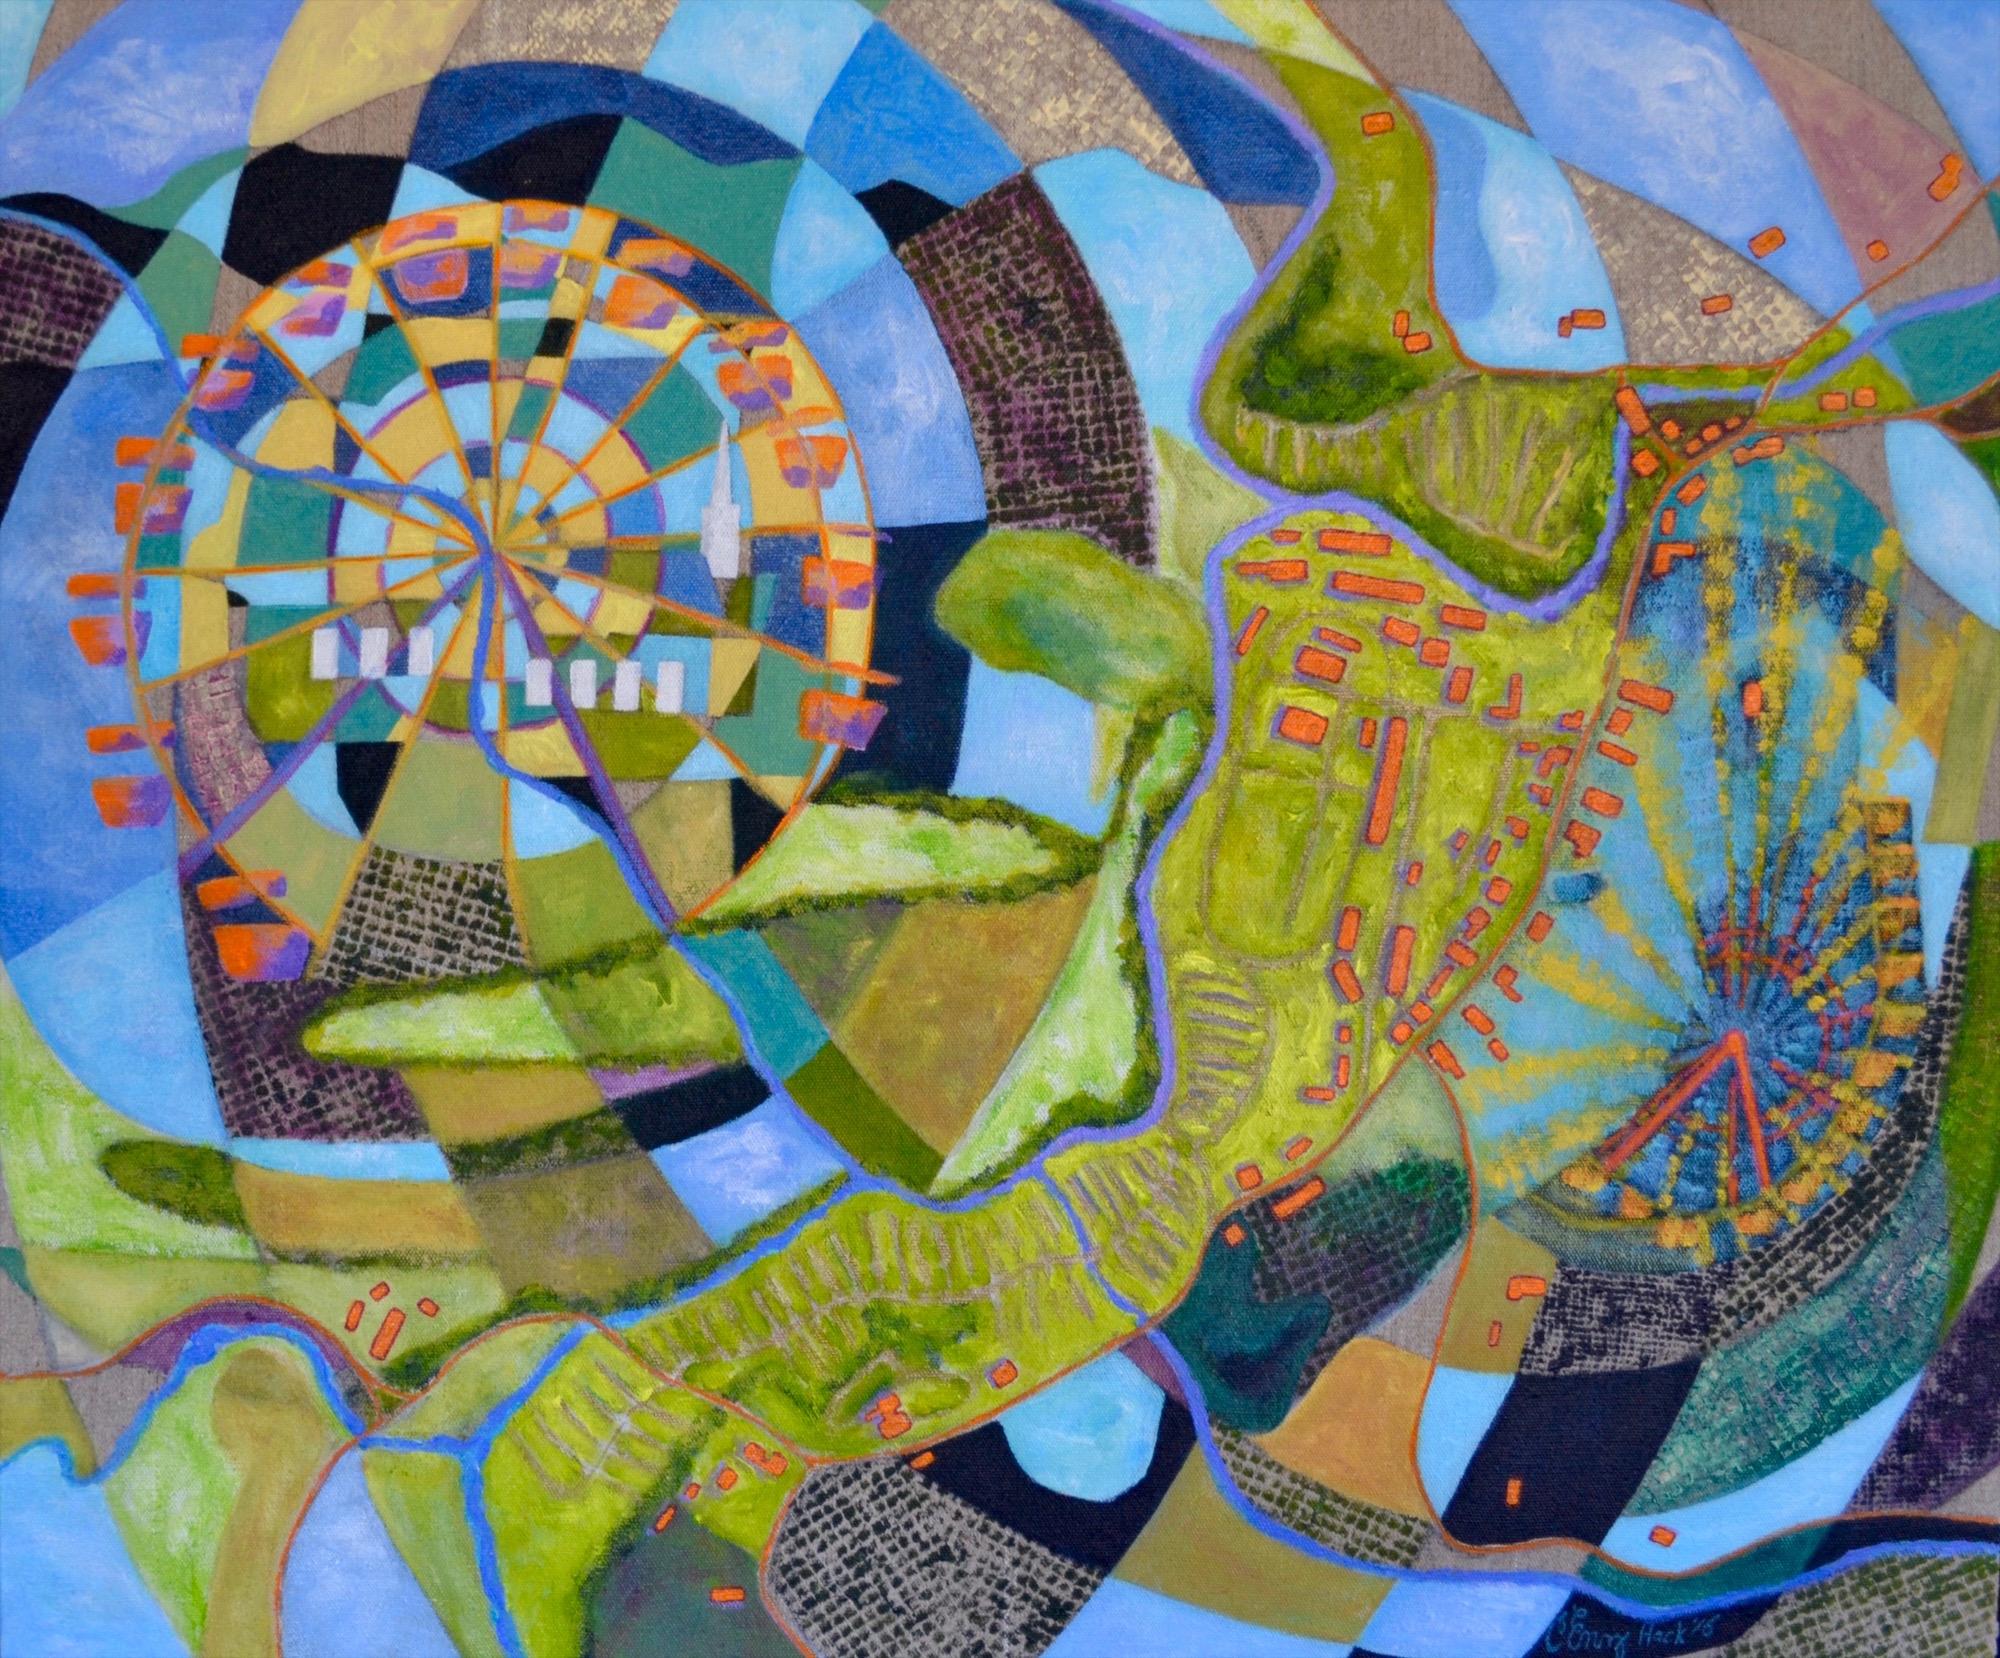 "A Fair to Remember - Tunbridge, Vermont Carolyn enz Hack acrylic on linen 30x36"" 2016"